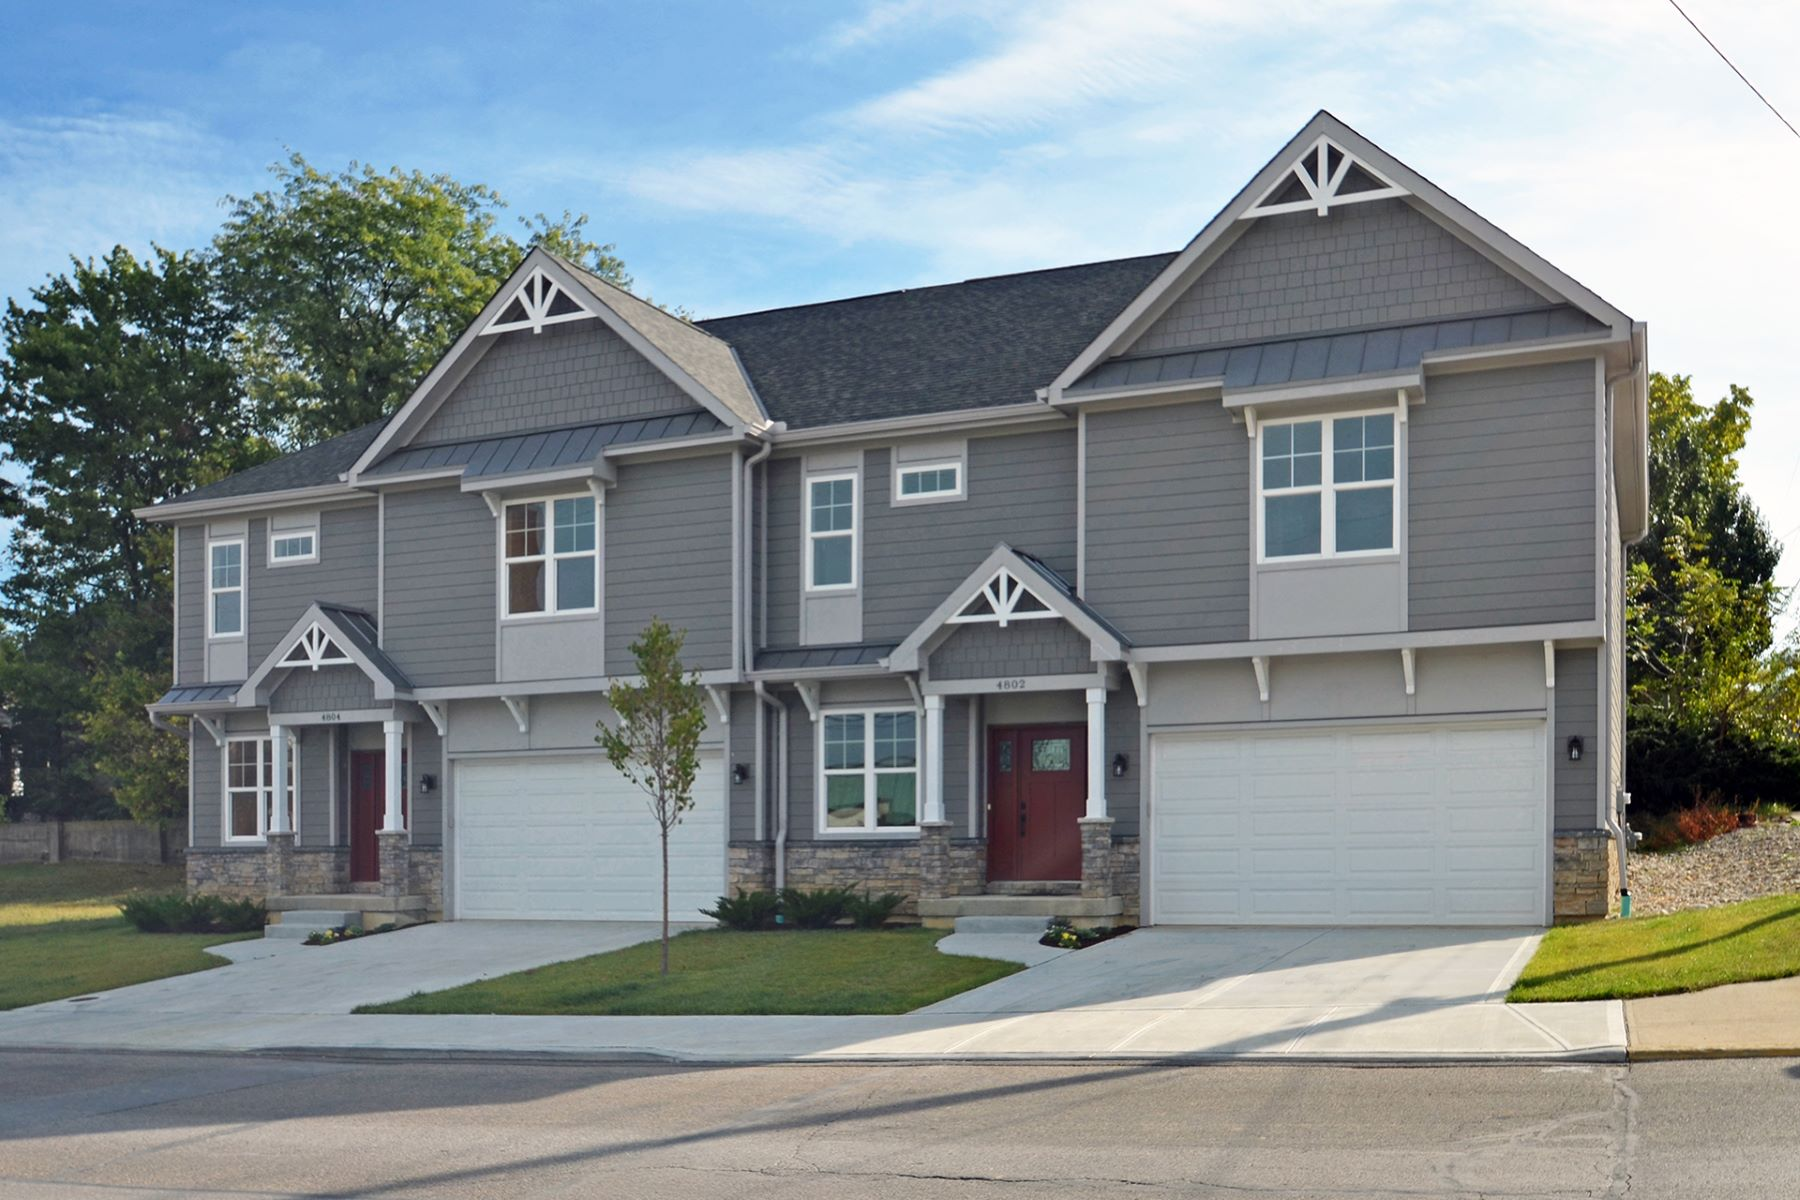 townhouses のために 売買 アット BRAND NEW energy efficient town home! 4804 Tower Ave., St. Bernard, オハイオ 45217 アメリカ